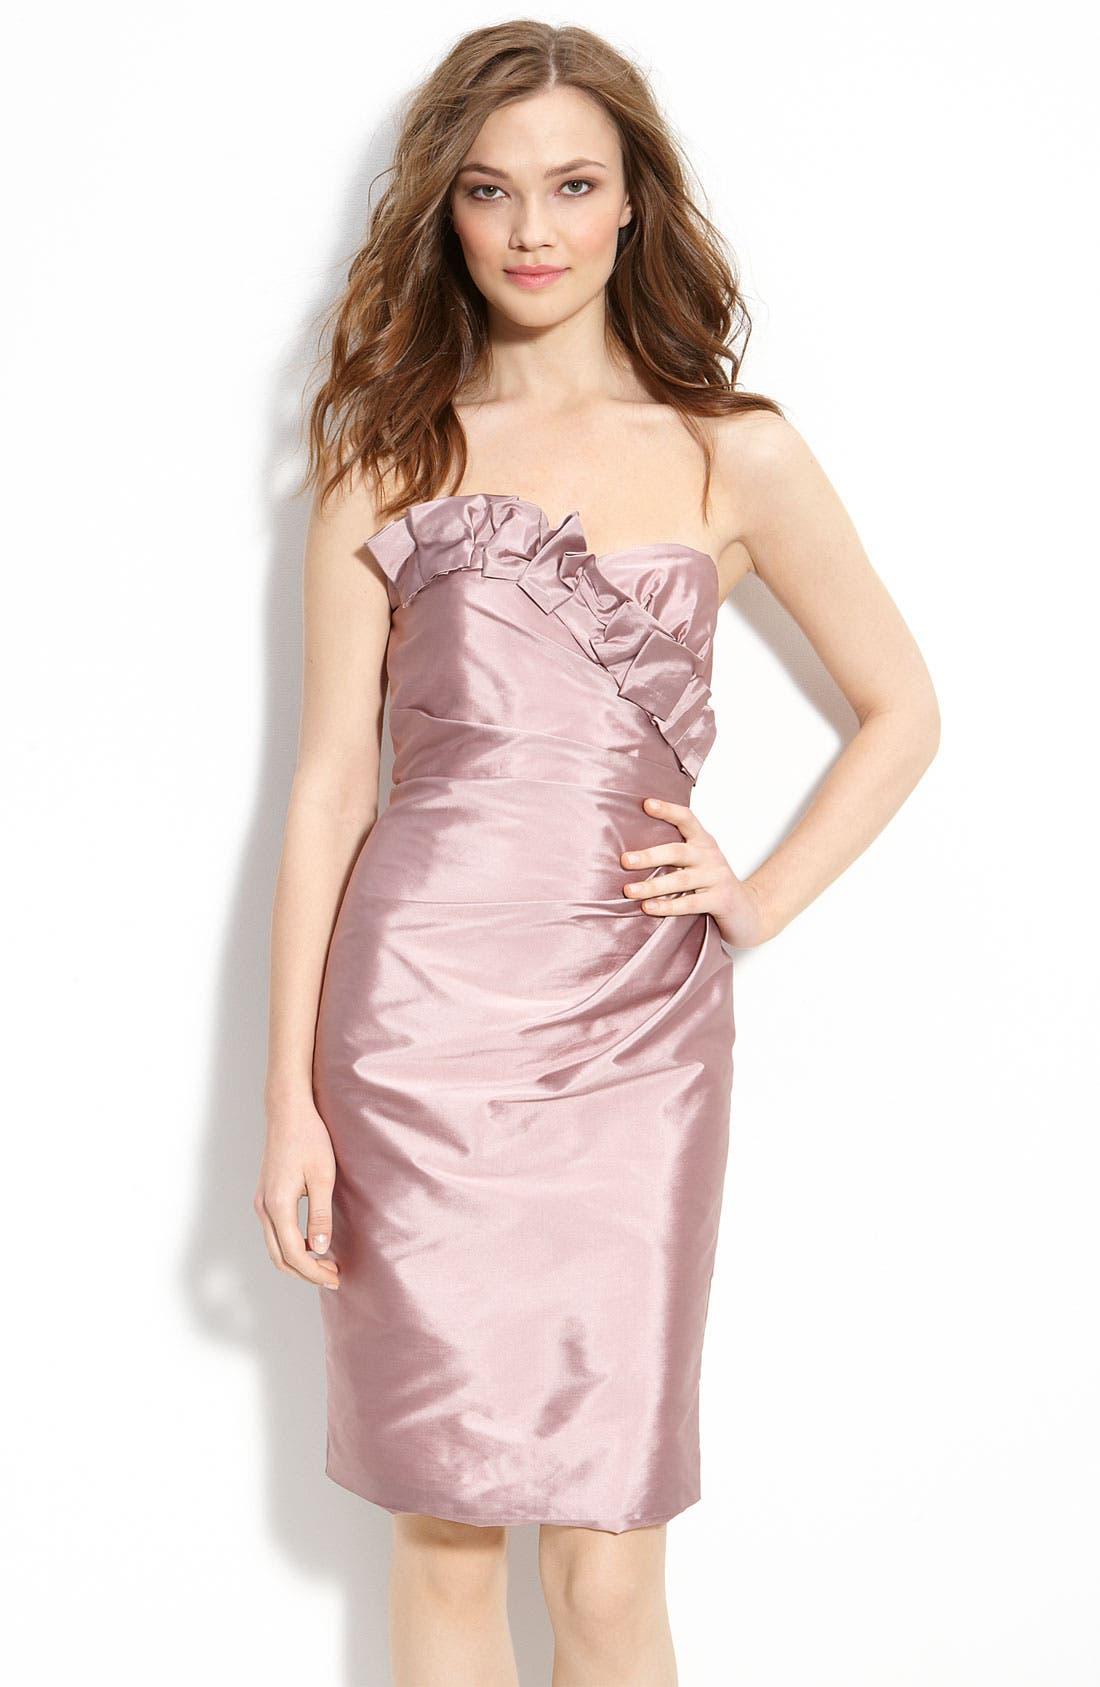 Main Image - ML Monique Lhuillier Bridesmaids Satin Ruffle Trim Strapless Dress (Nordstrom Exclusive)